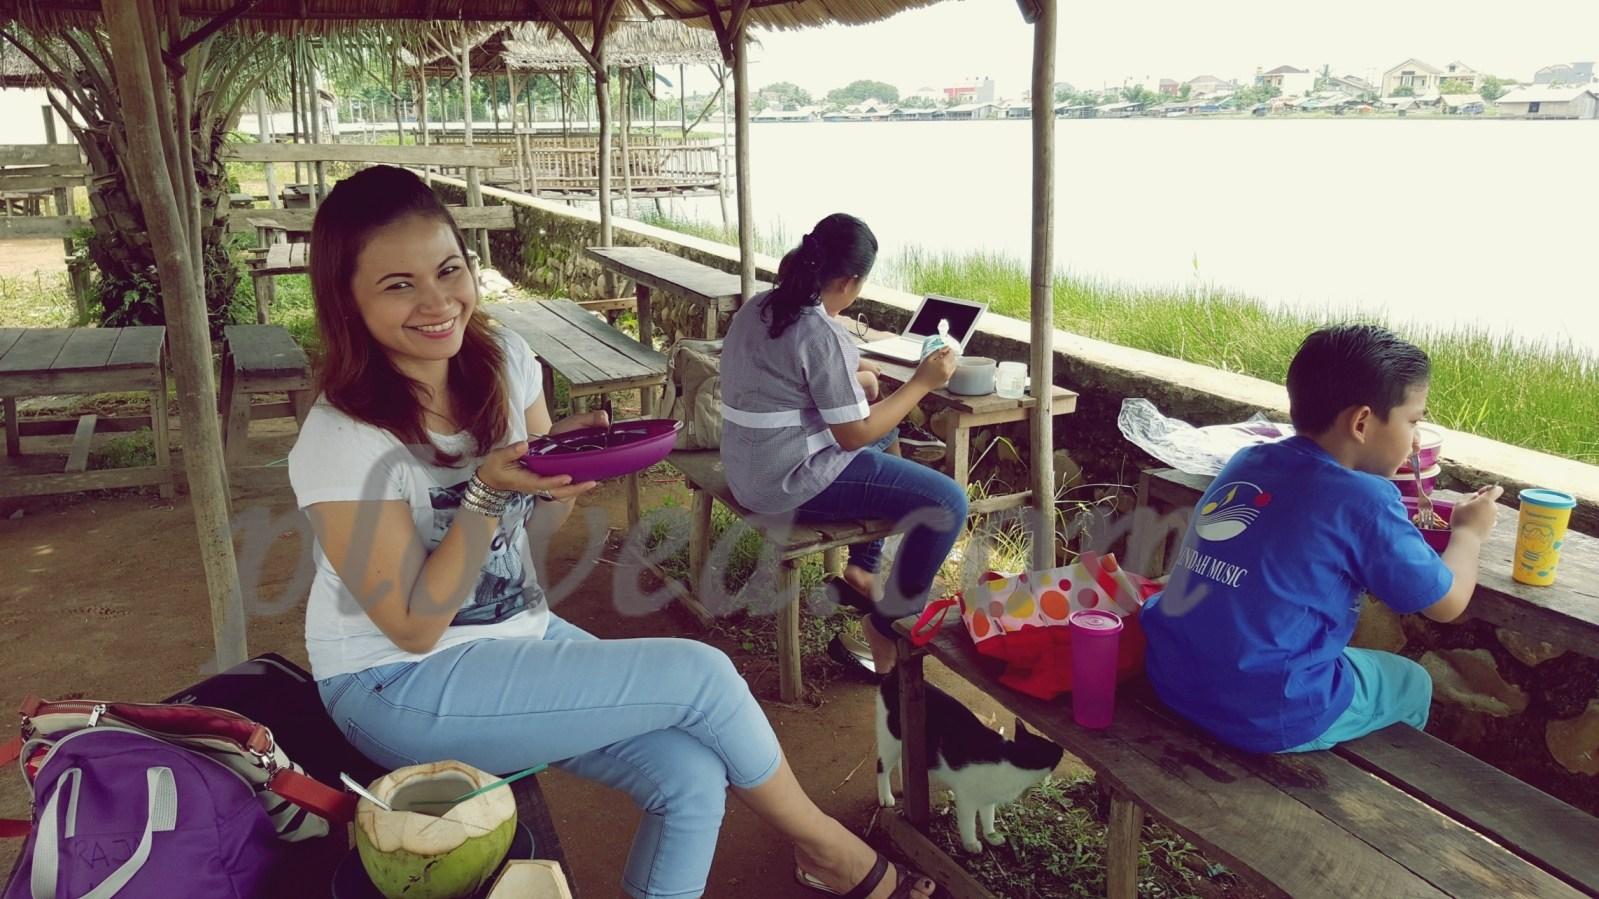 Palembang Bird Park Samosir Meets Krones Abang Tuh Tampak Menikmati